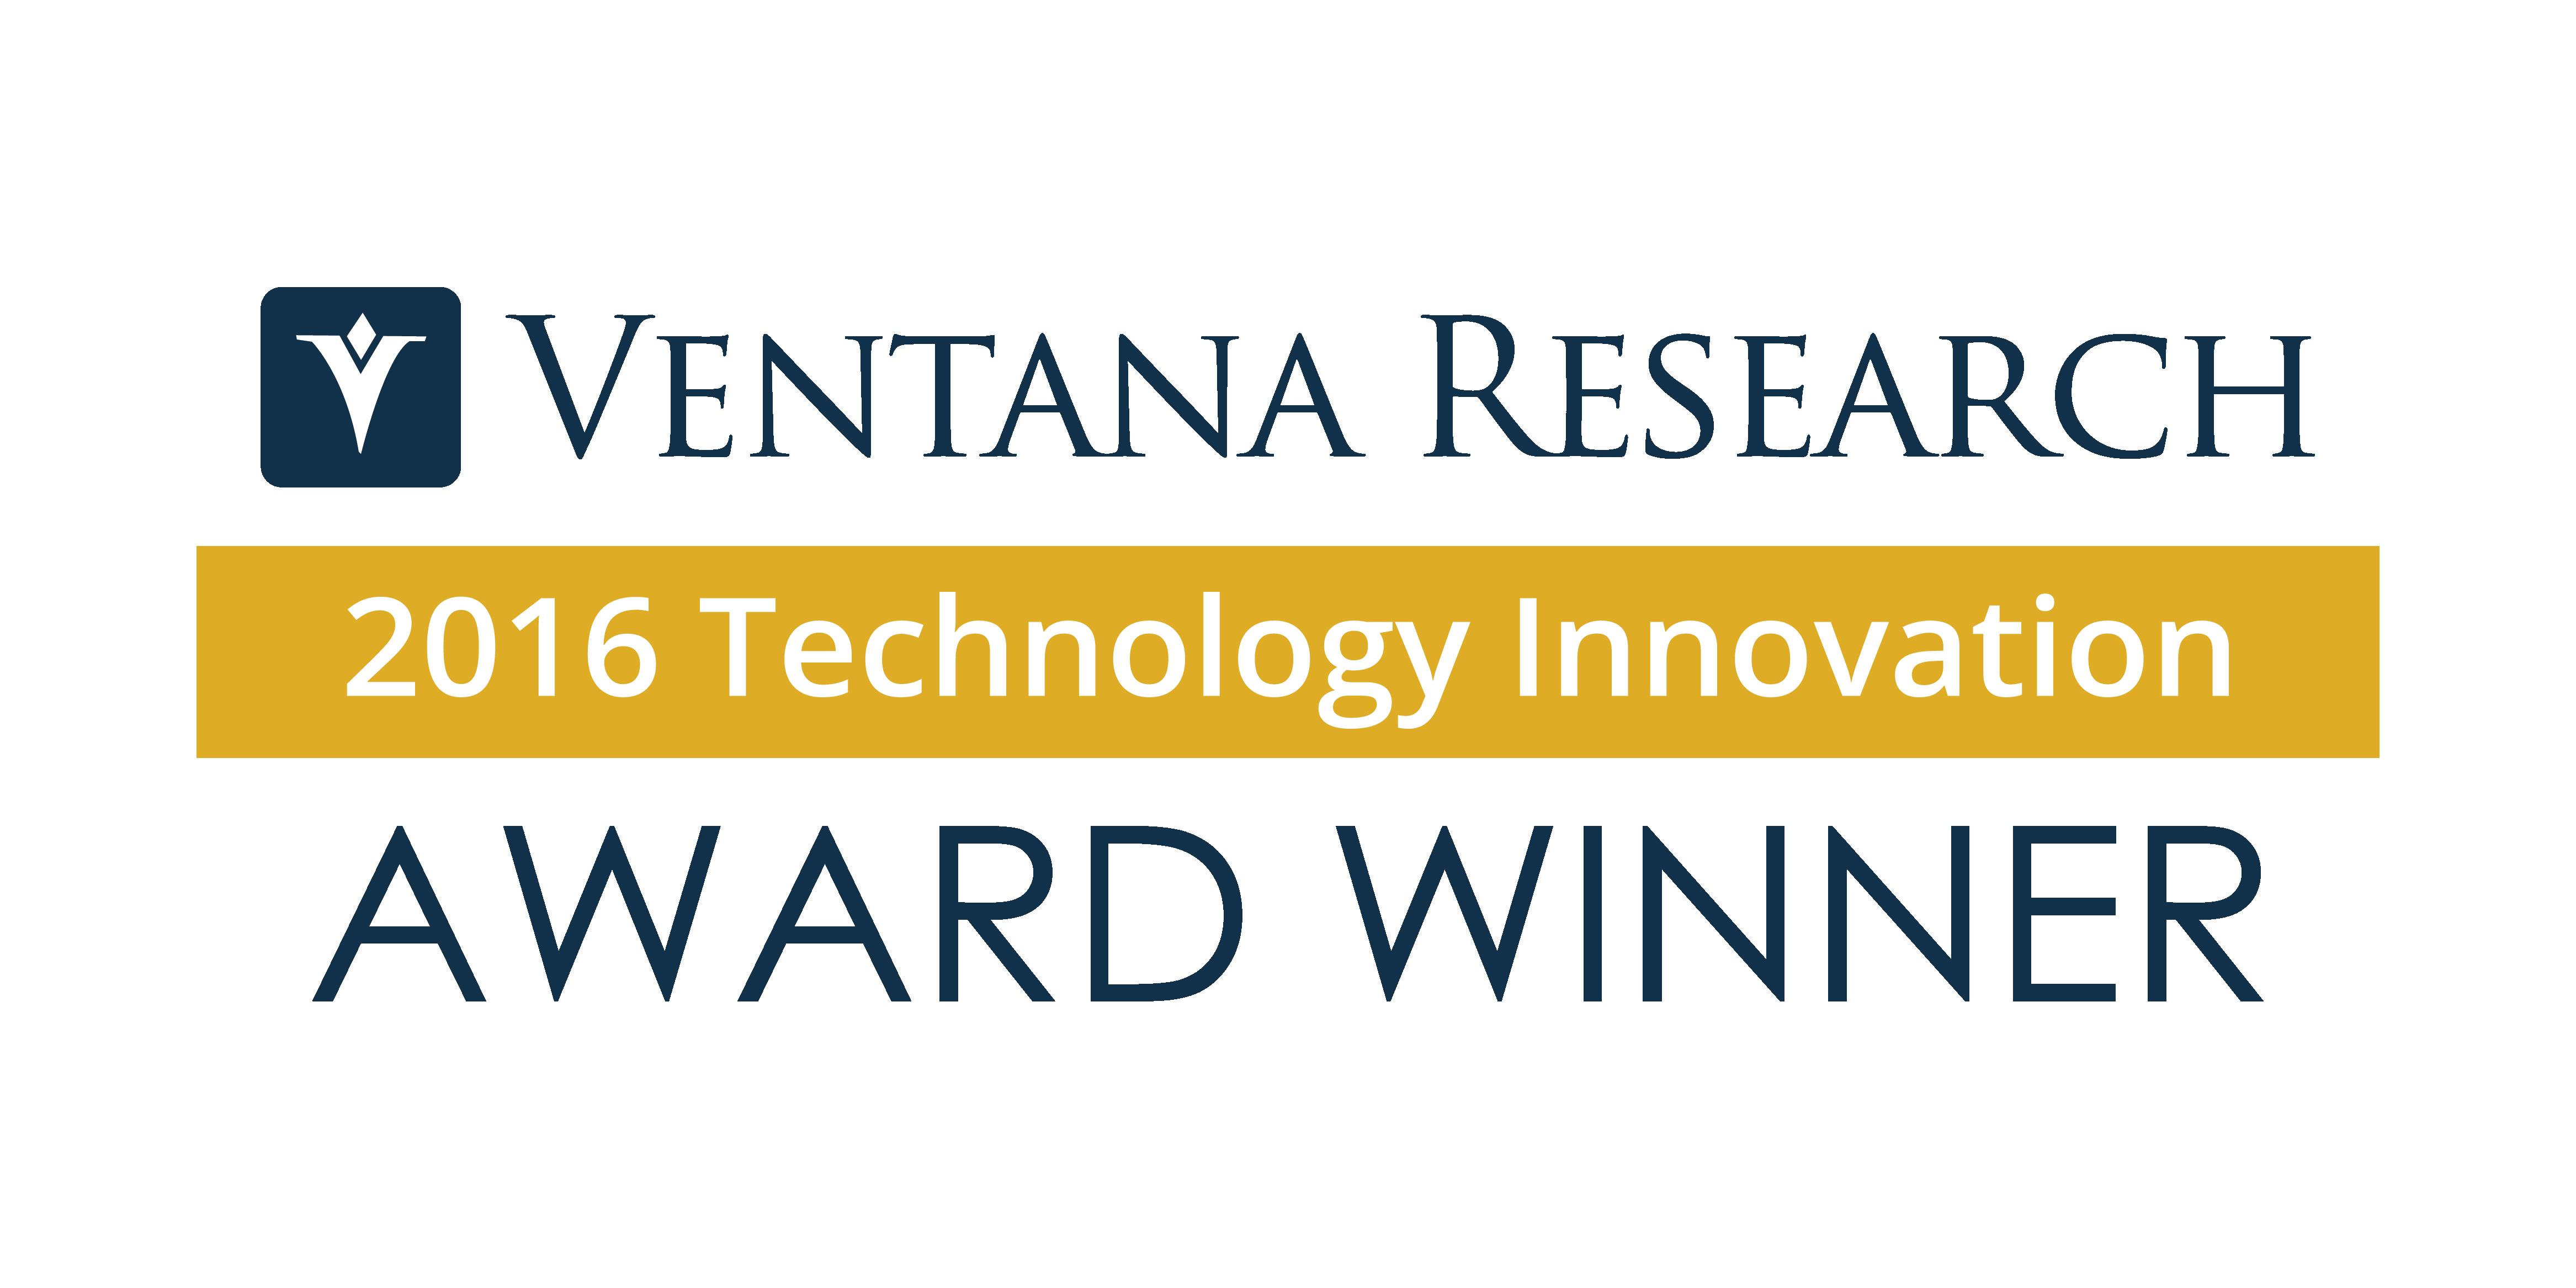 VentanaResearch_TechnologyInnovationAwards_Winner2016_clear-2.png